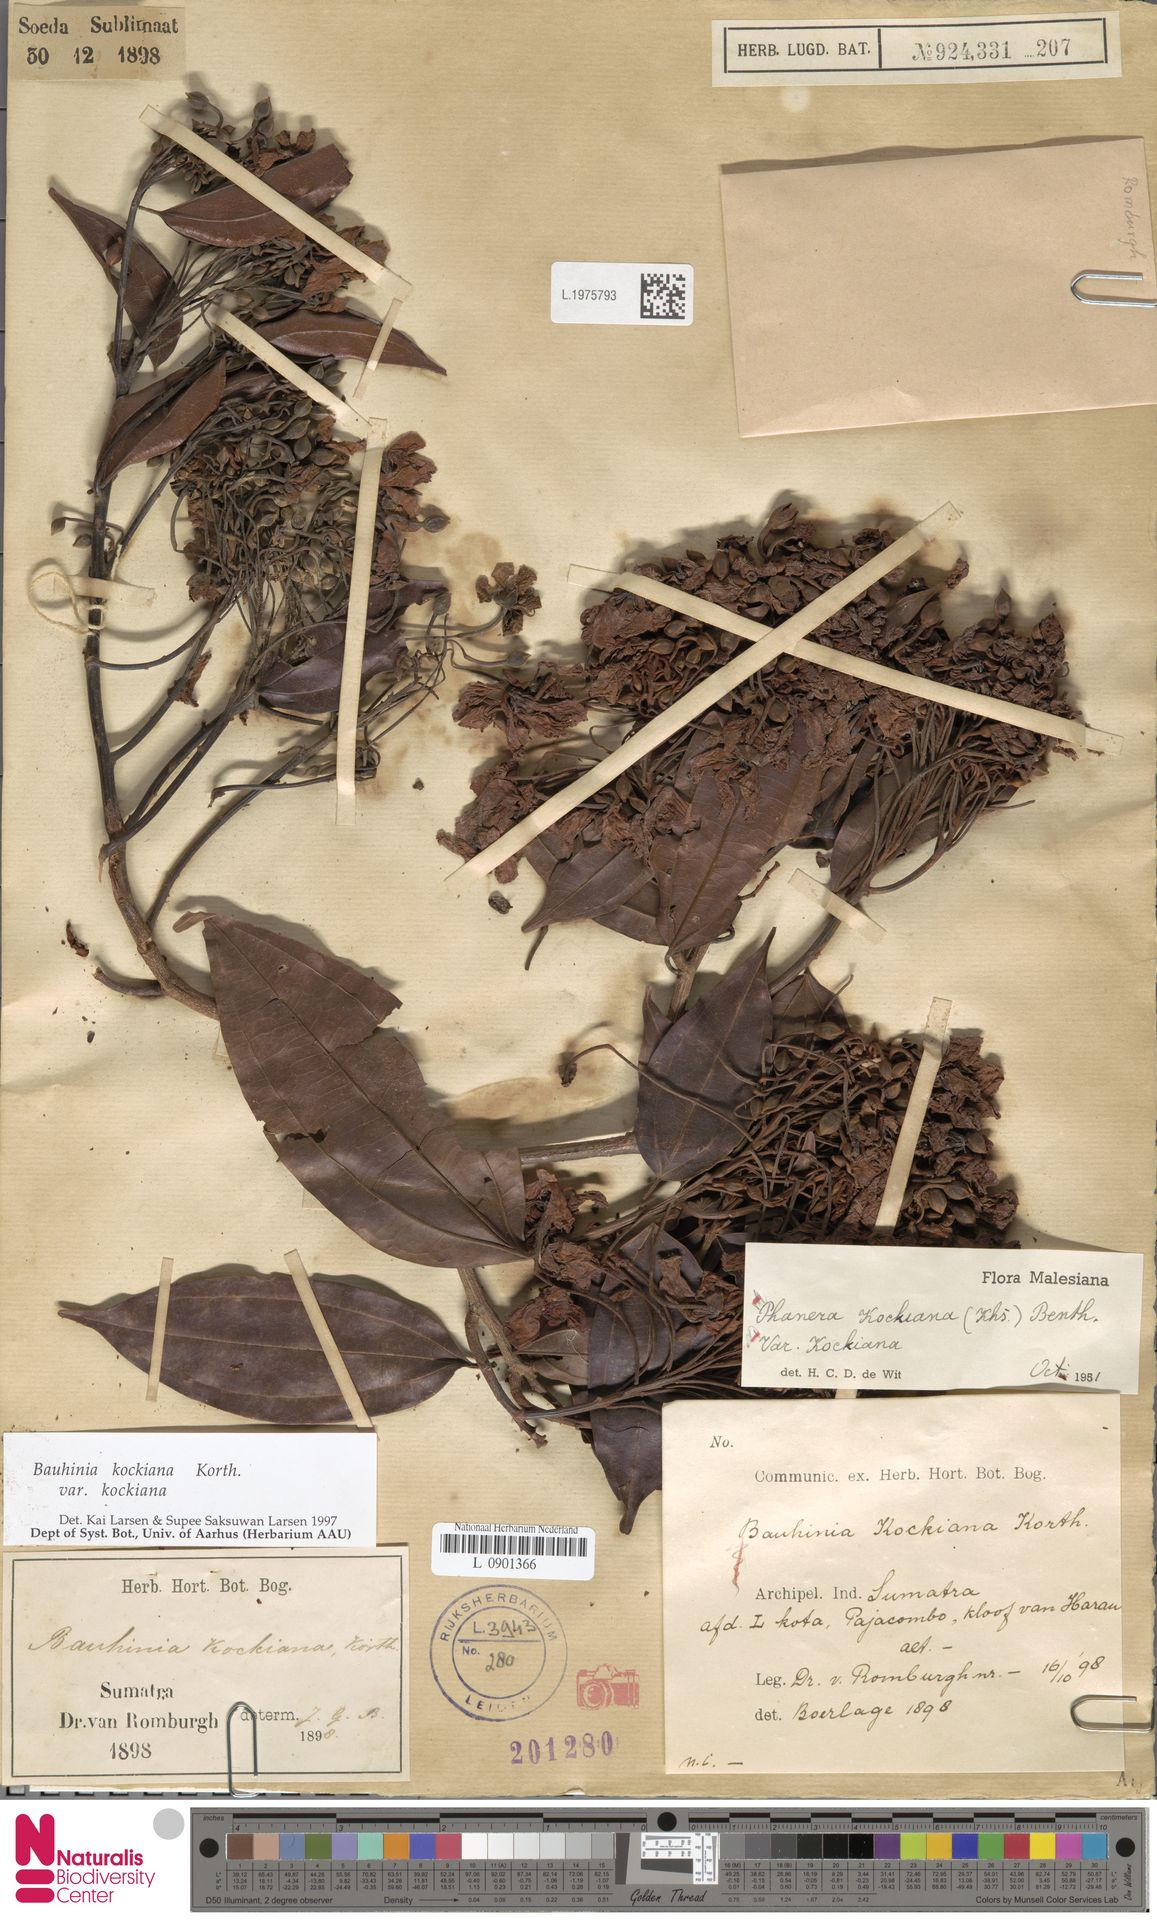 L.1975793 | Bauhinia kockiana var. kockiana